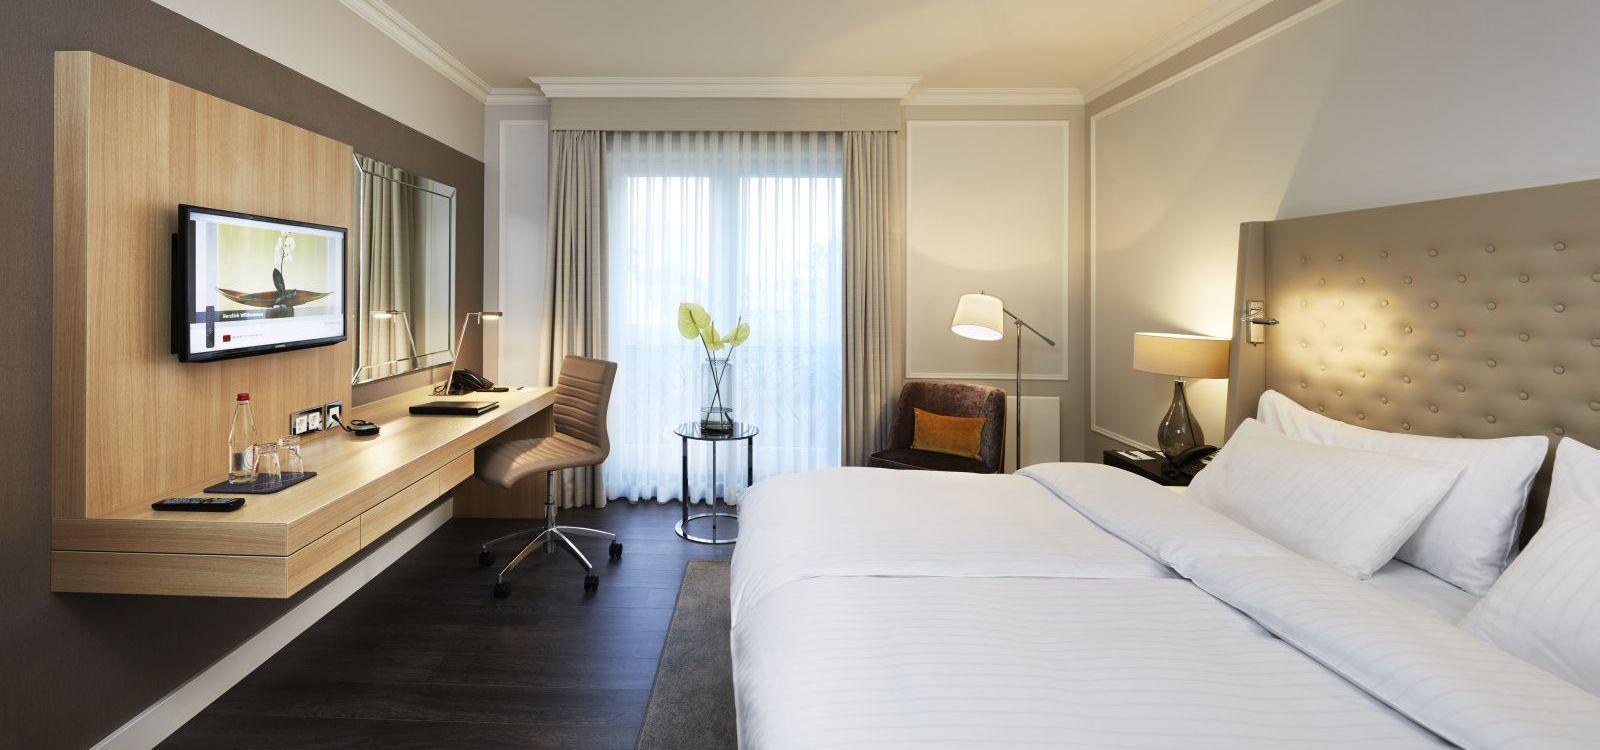 The Westin Grand Berlin - EVENT Hotels - Intl. Markenhotellerie in ...